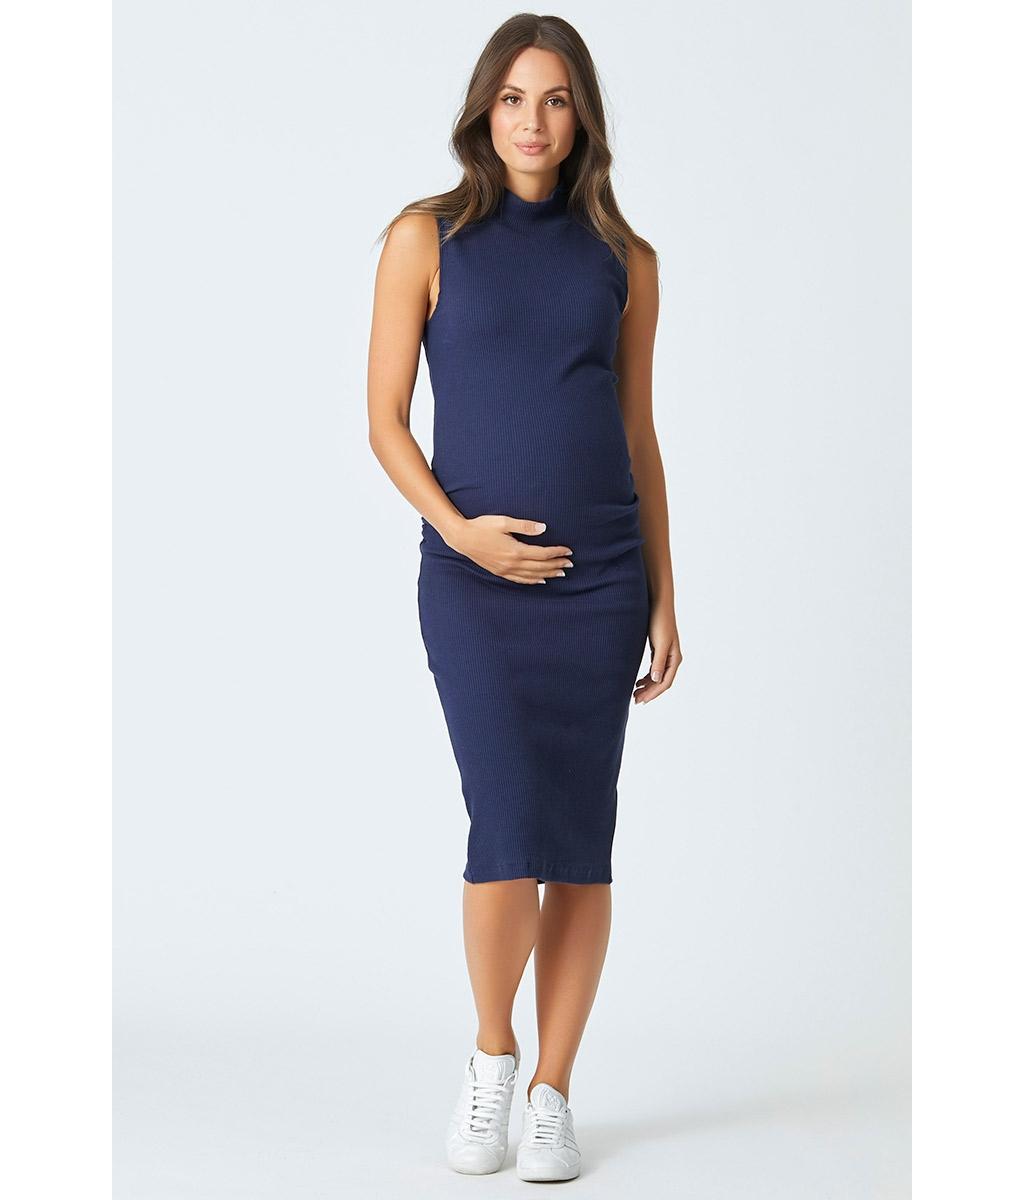 Audrey maternity rib dress 3 bears stylish navy cotton stretch rib maternity bodycon dress ombrellifo Choice Image